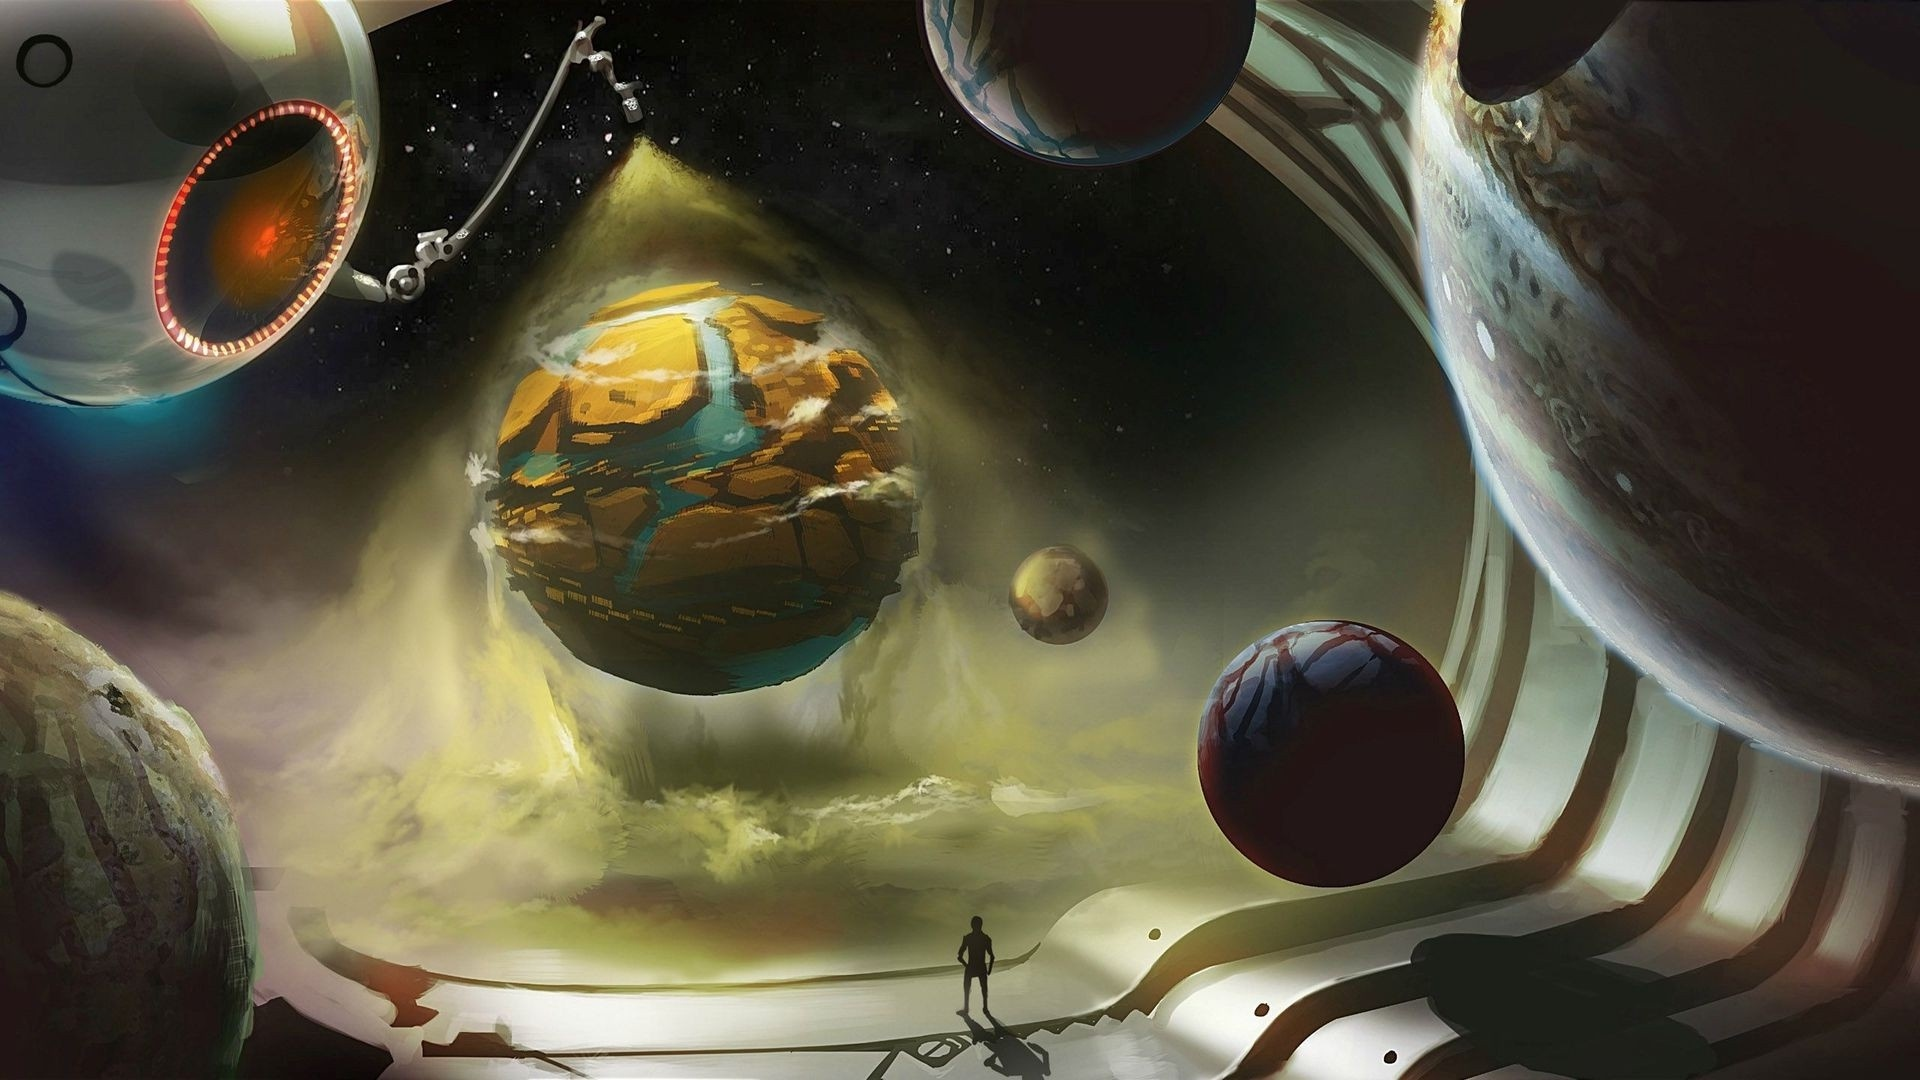 Alien Planet Art Pic